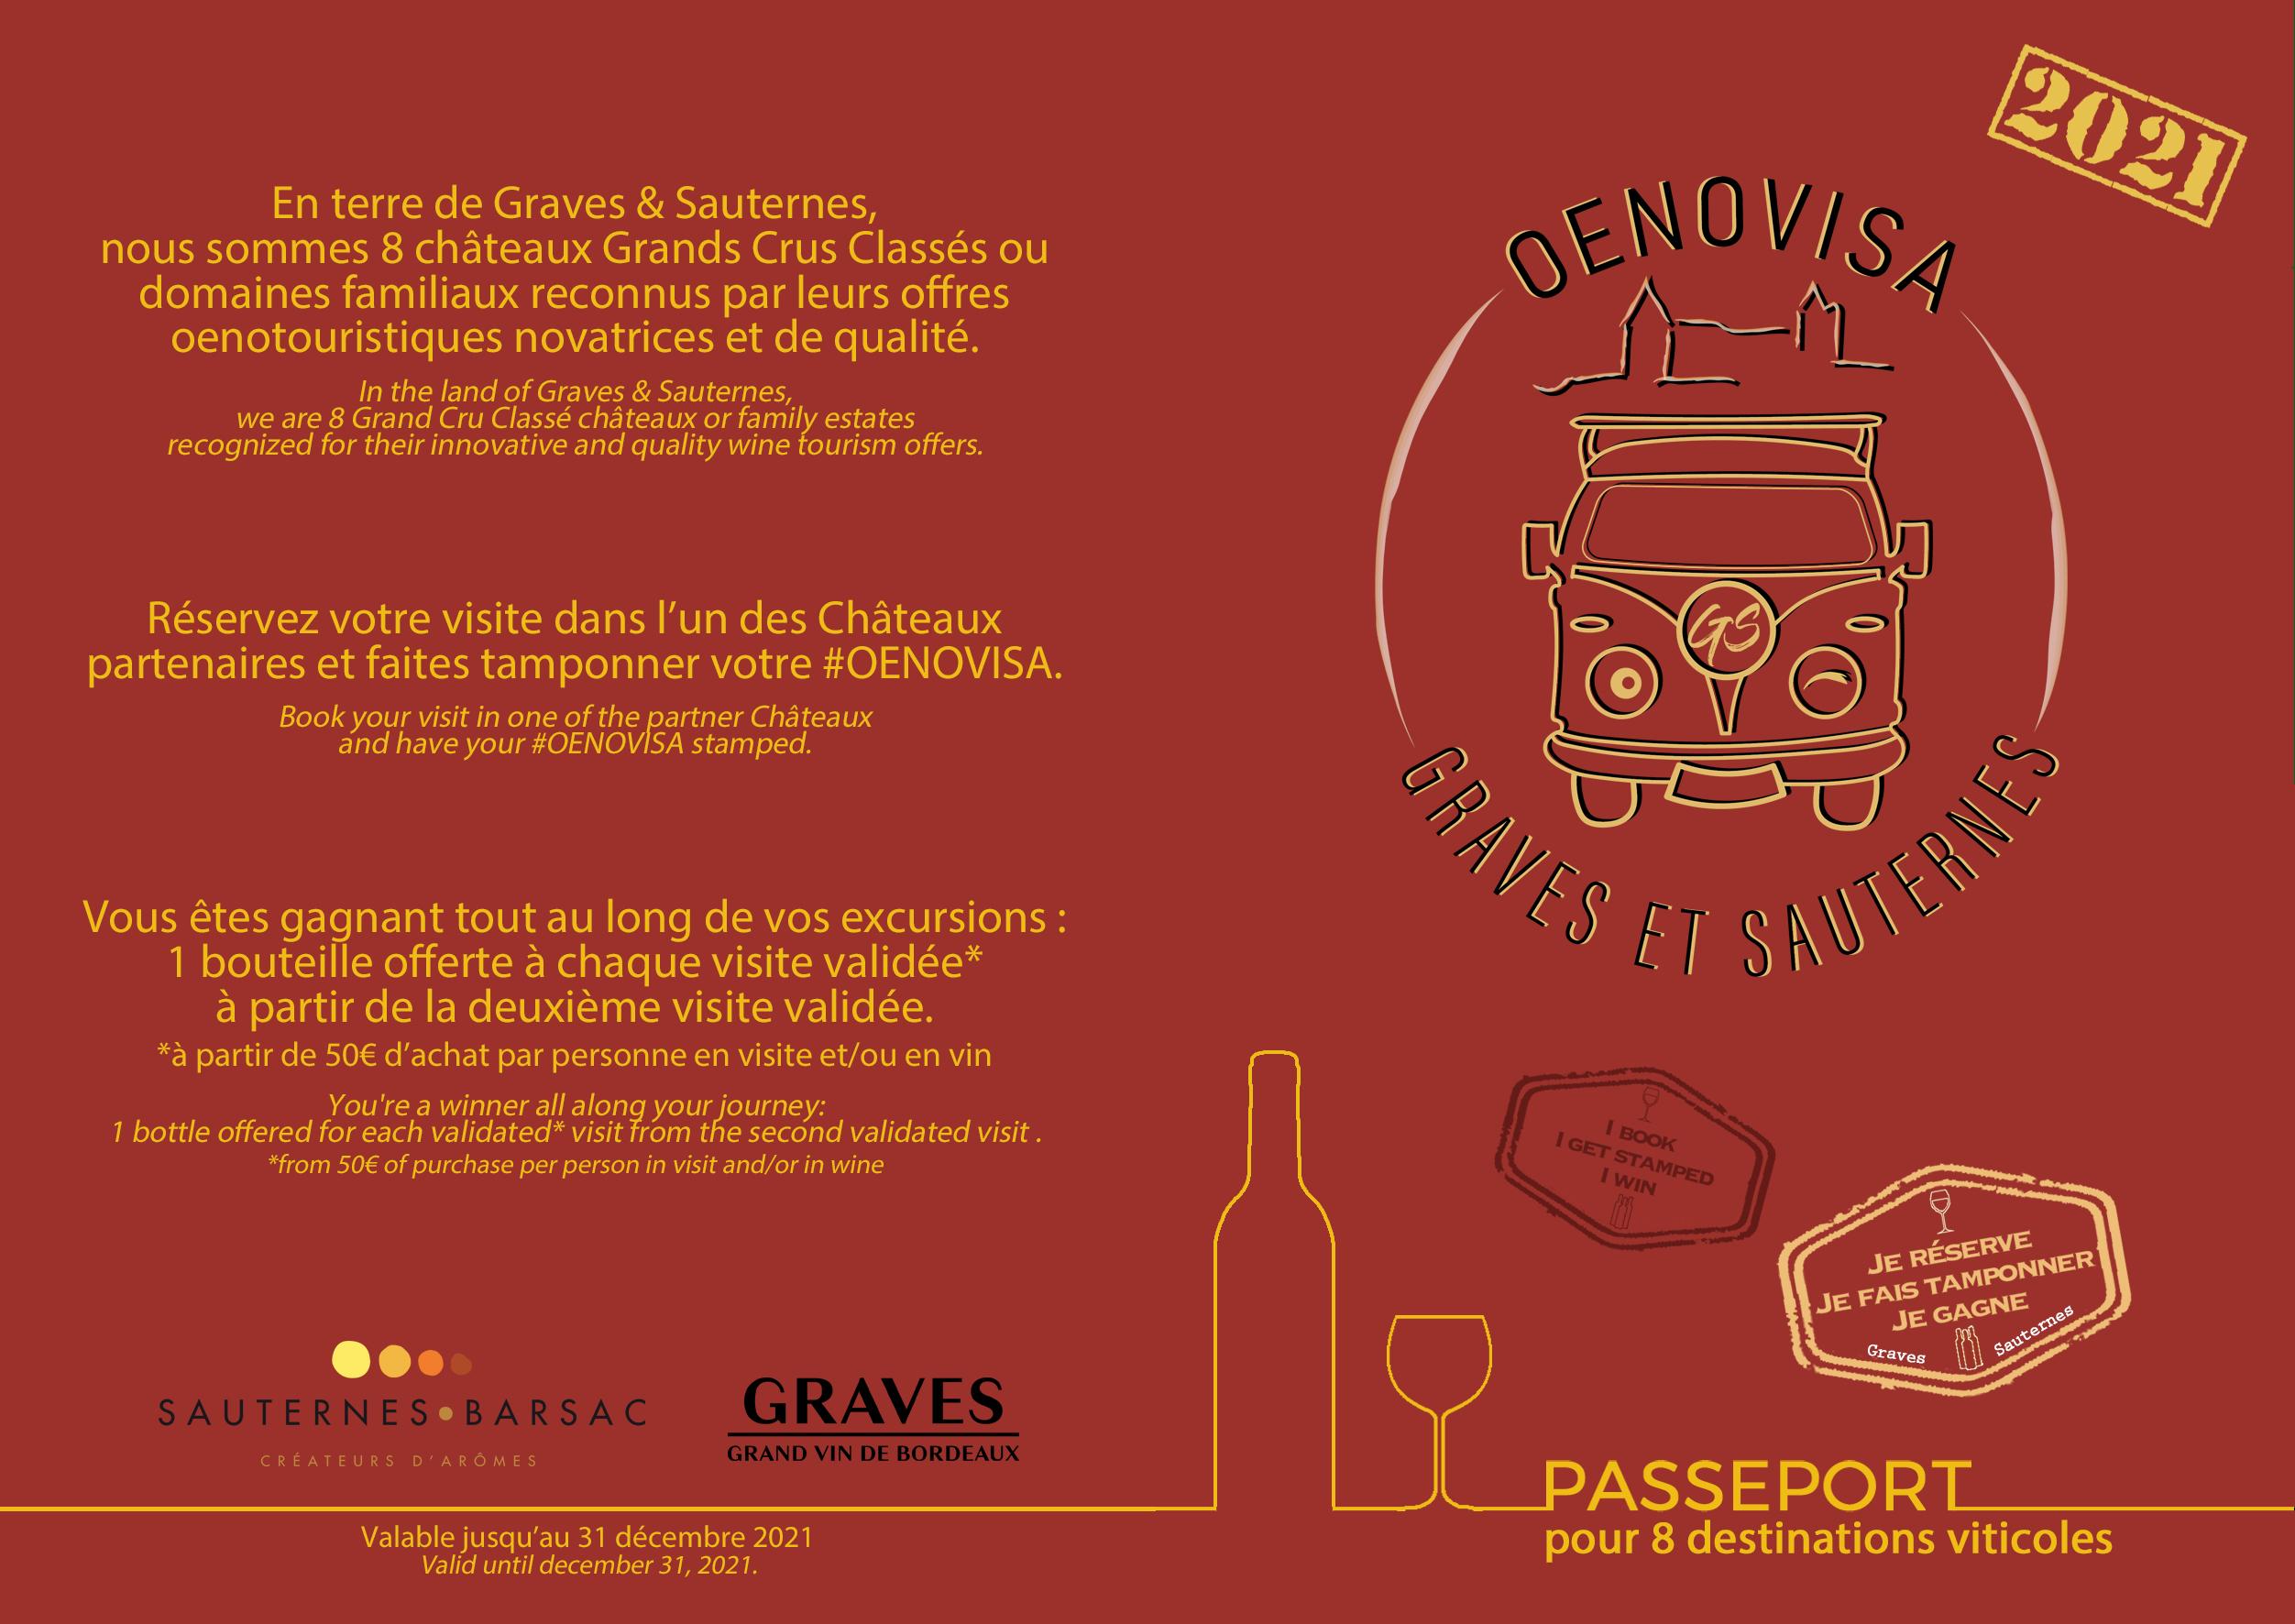 Couverture Passeport Oenovisa